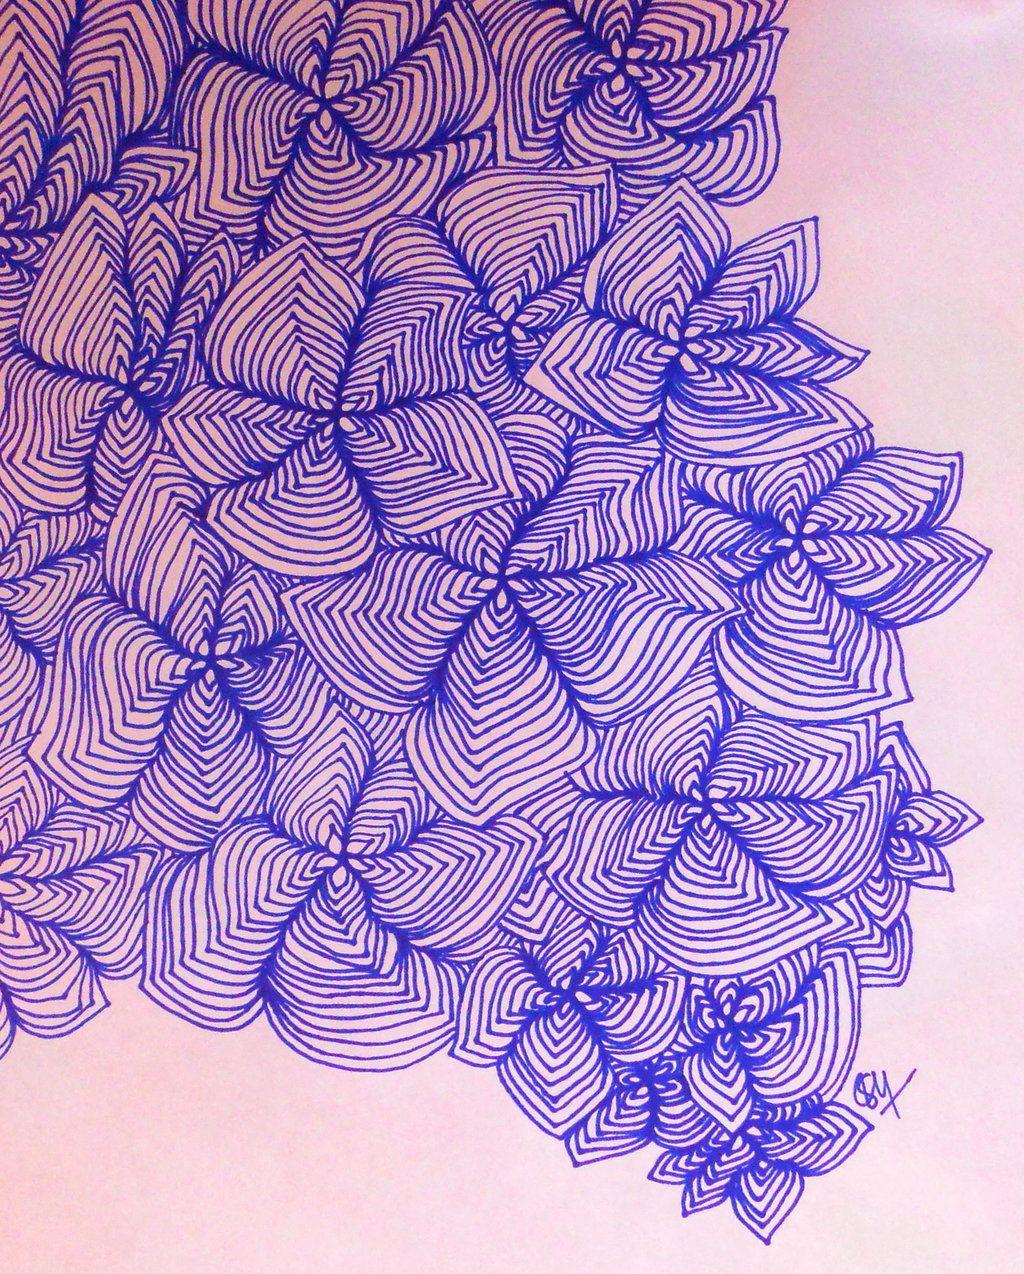 blue flowers tumblr - Pesquisa Google